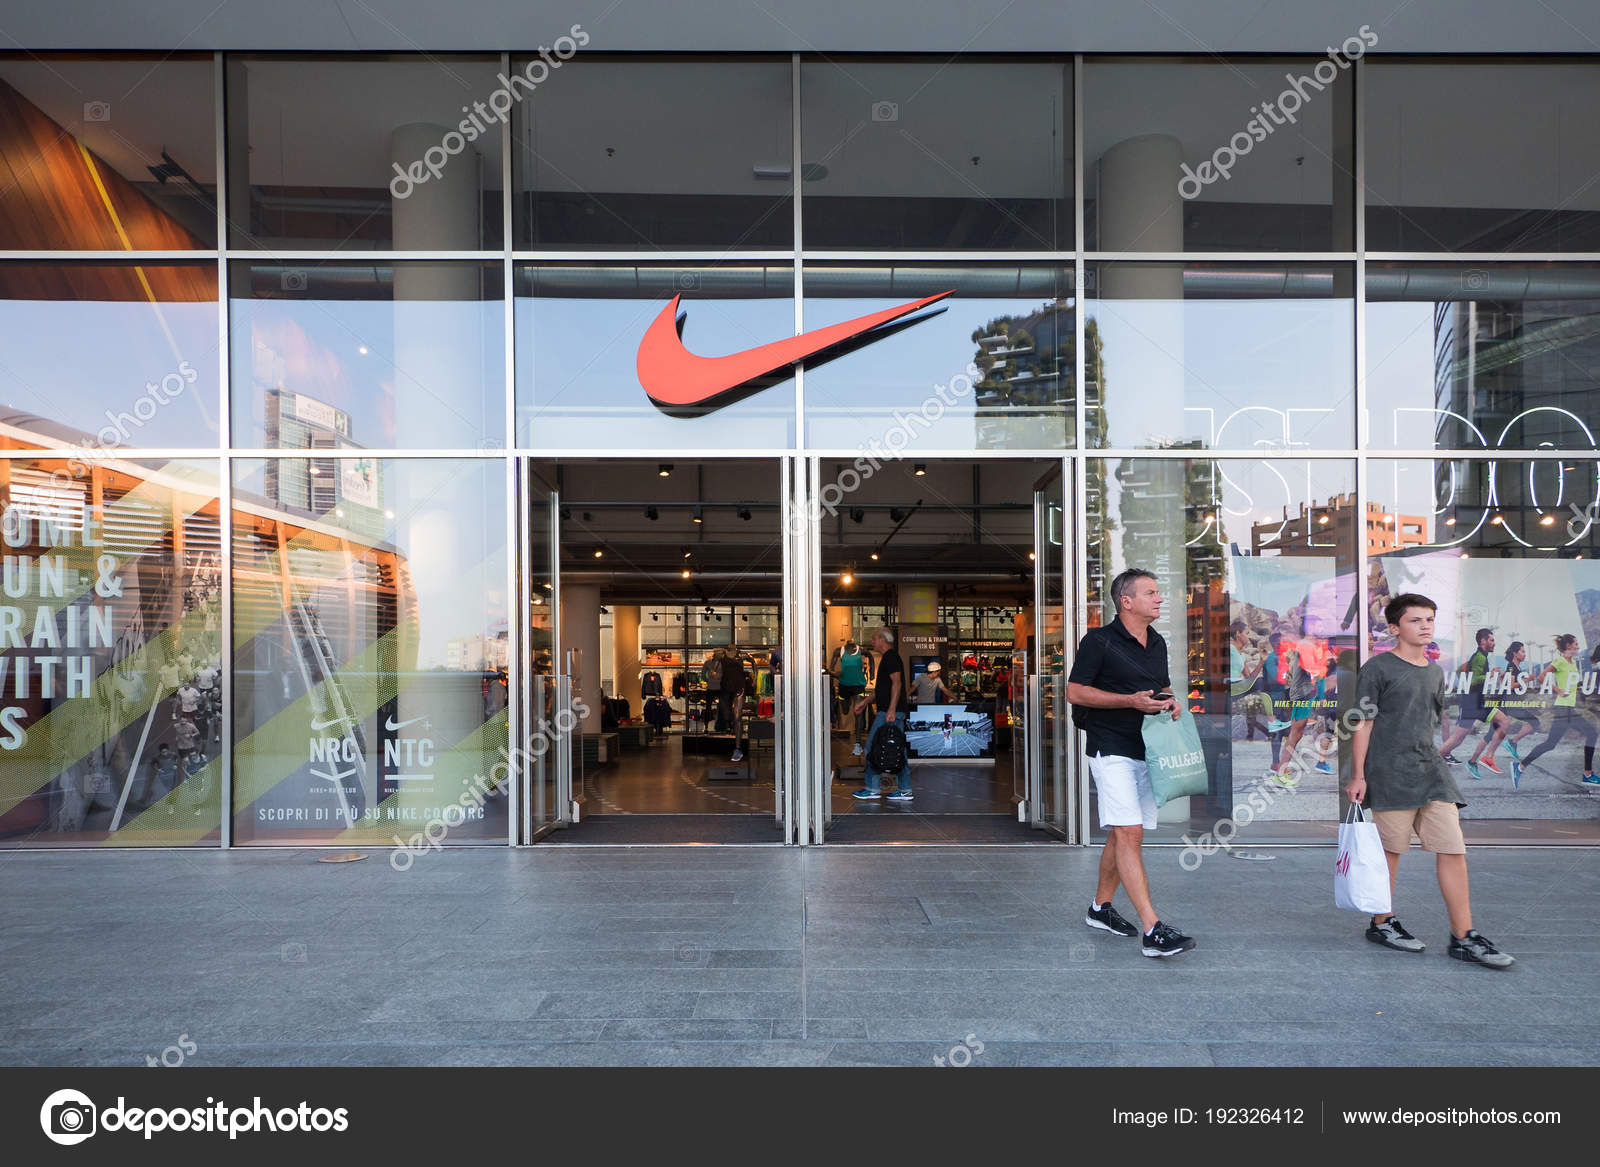 830d4160278 Μιλάνο, Ιταλία - 27 Σεπτέμβριος 2016: Κατάστημα Nike sport στην πλατεία  Αουλέντι. Nike είναι ένας από τους παγκόσμιους μεγαλύτερους προμηθευτές  αθλητικά ...